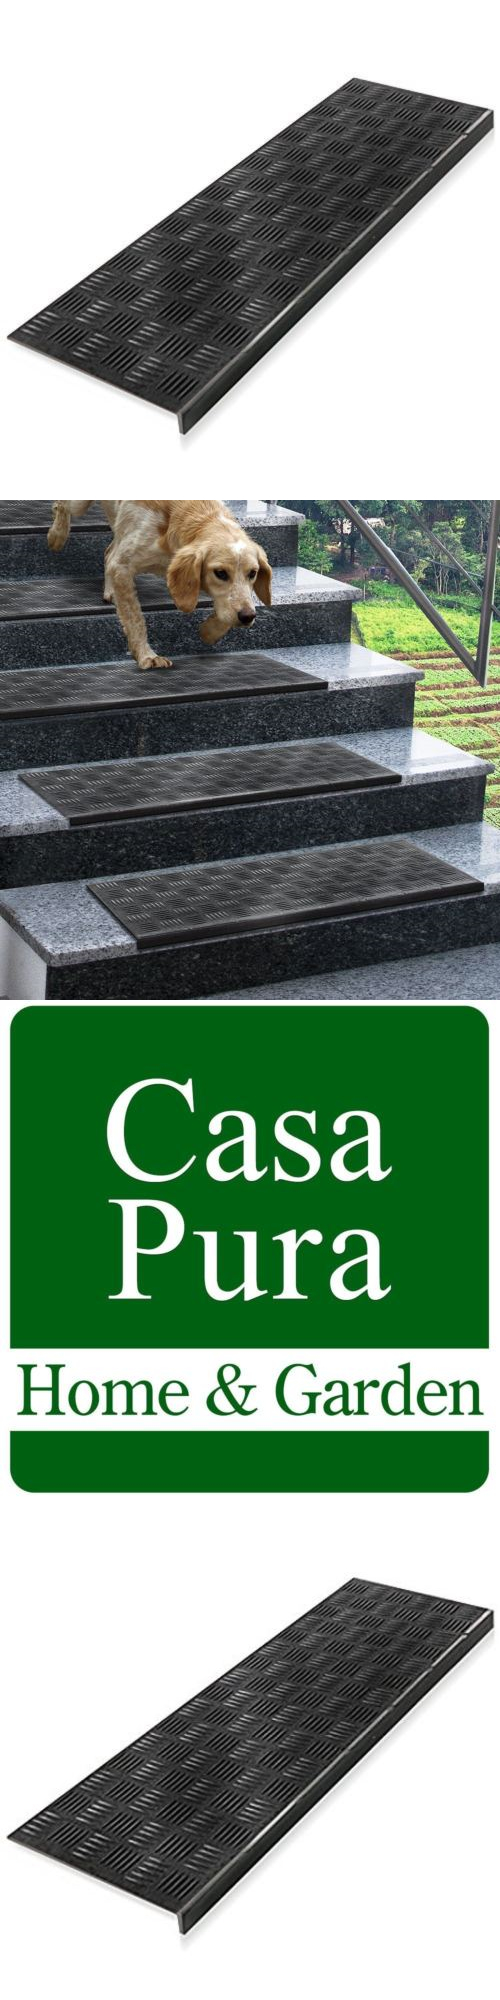 Stair Treads 175517: 5 Piece Weatherproof Superb Grip Indoor Outdoor  Non Slip Rubber